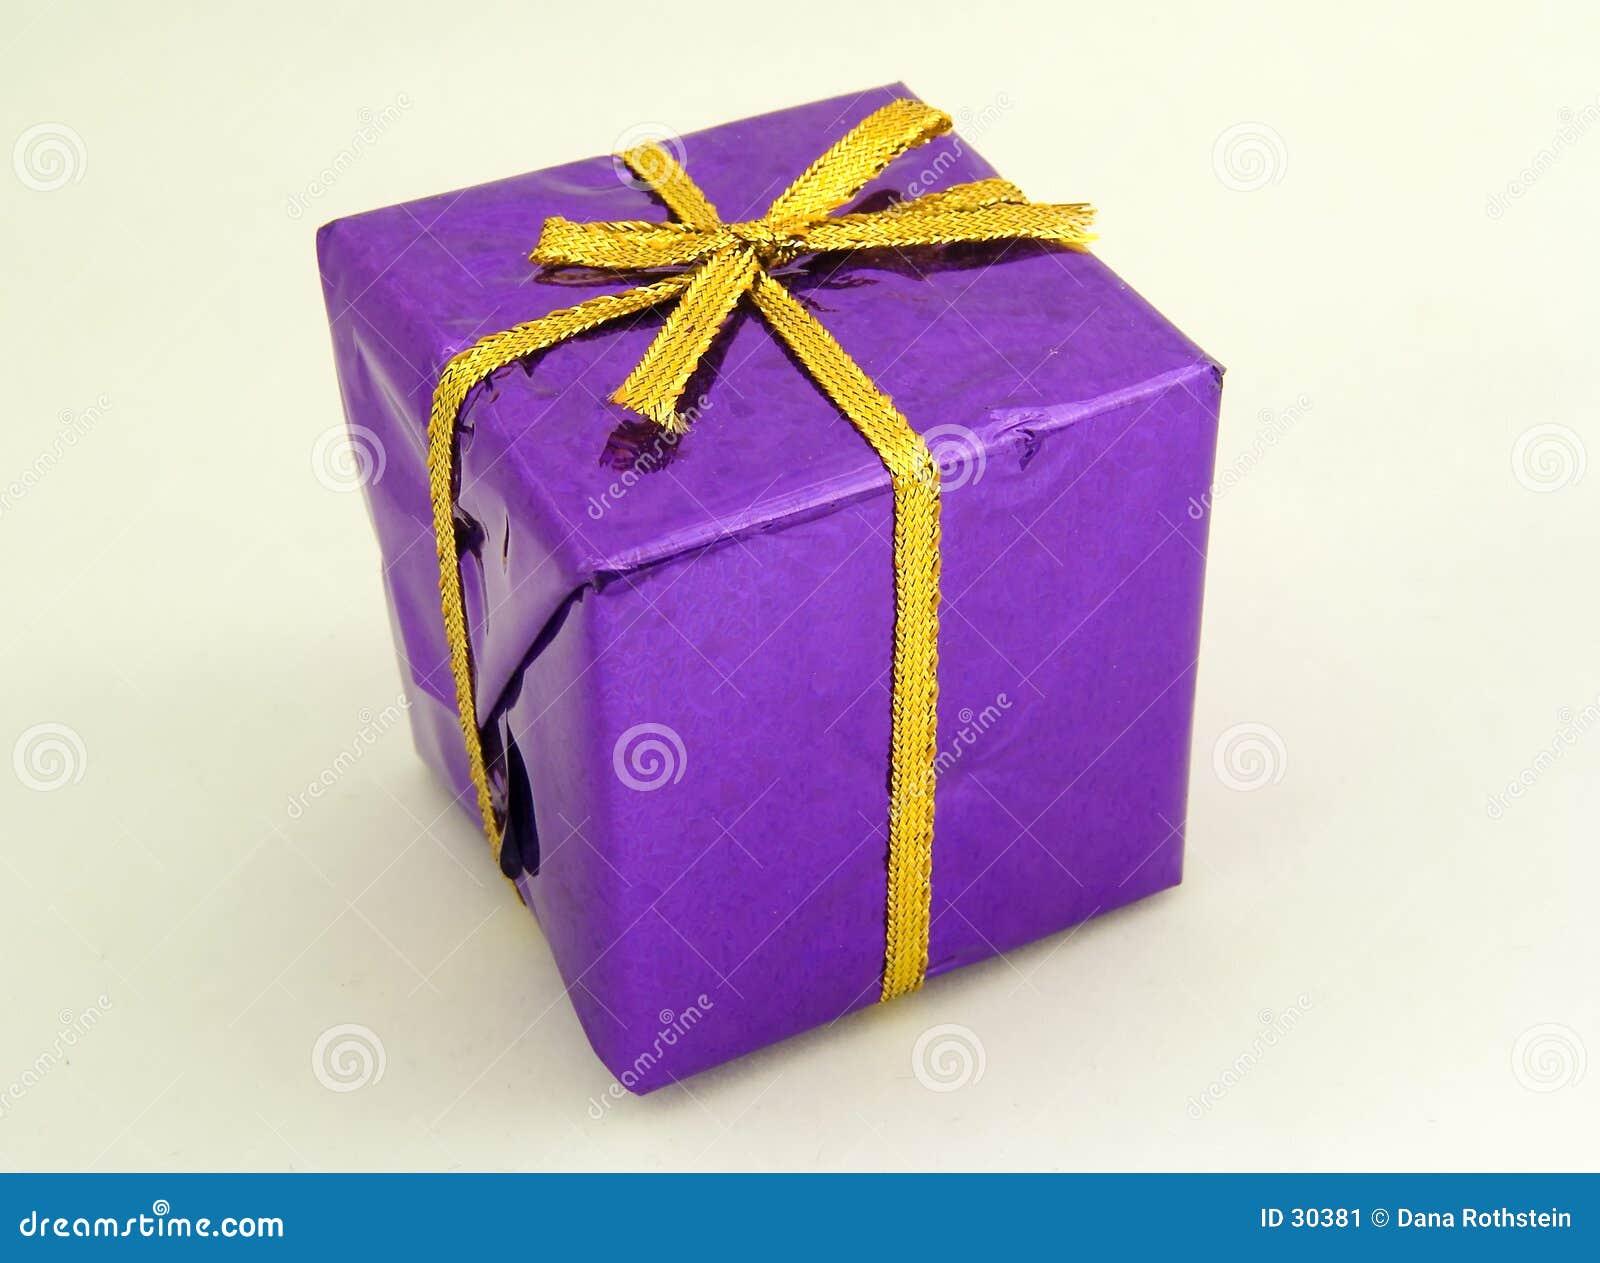 Giftbox紫色